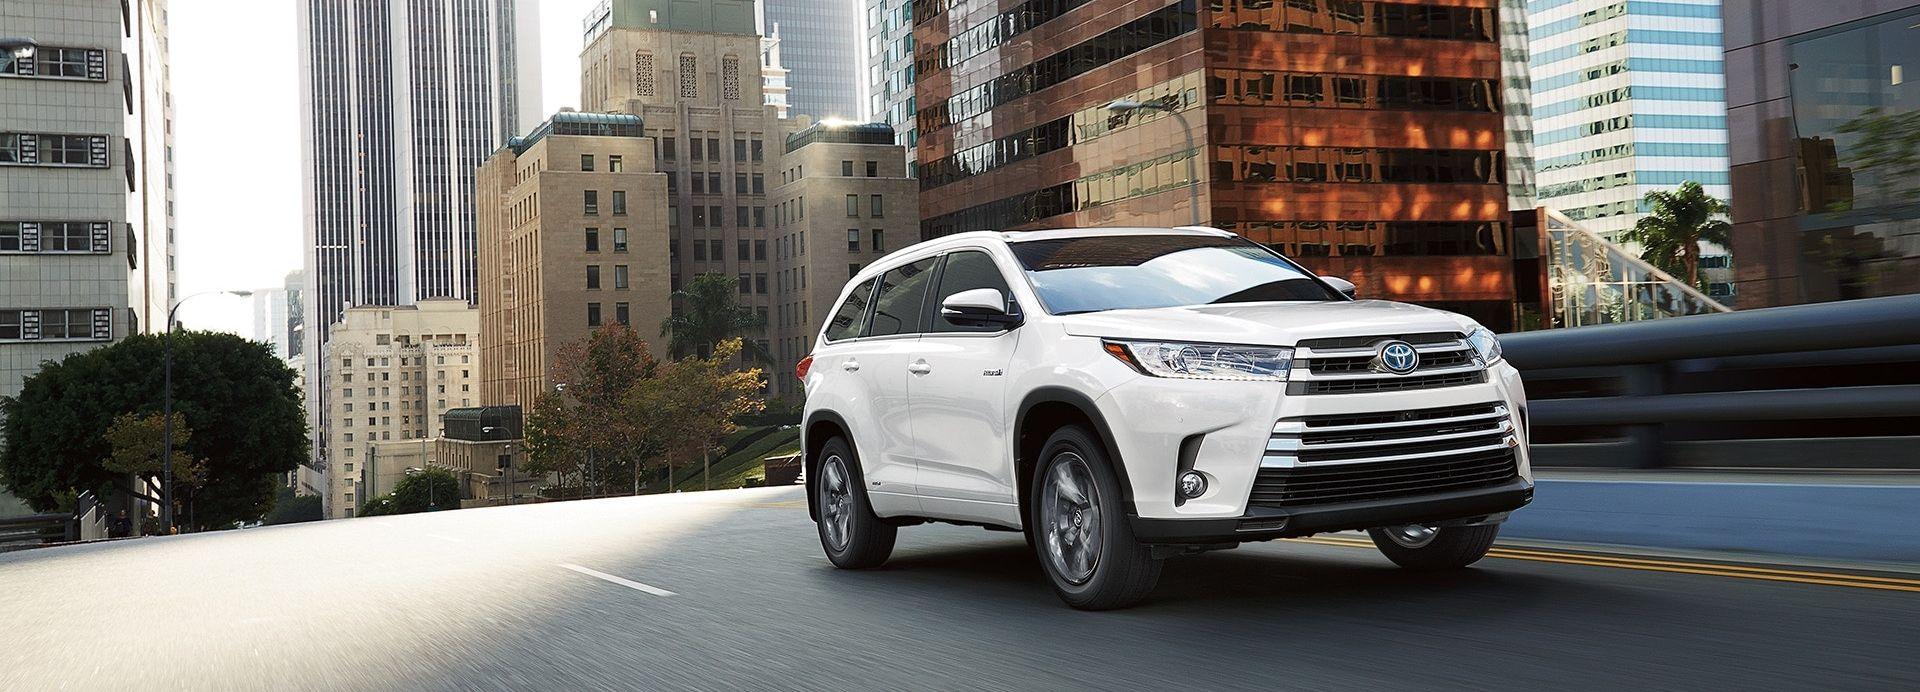 2018 Toyota Highlander Hybrid for Sale near Olathe, KS